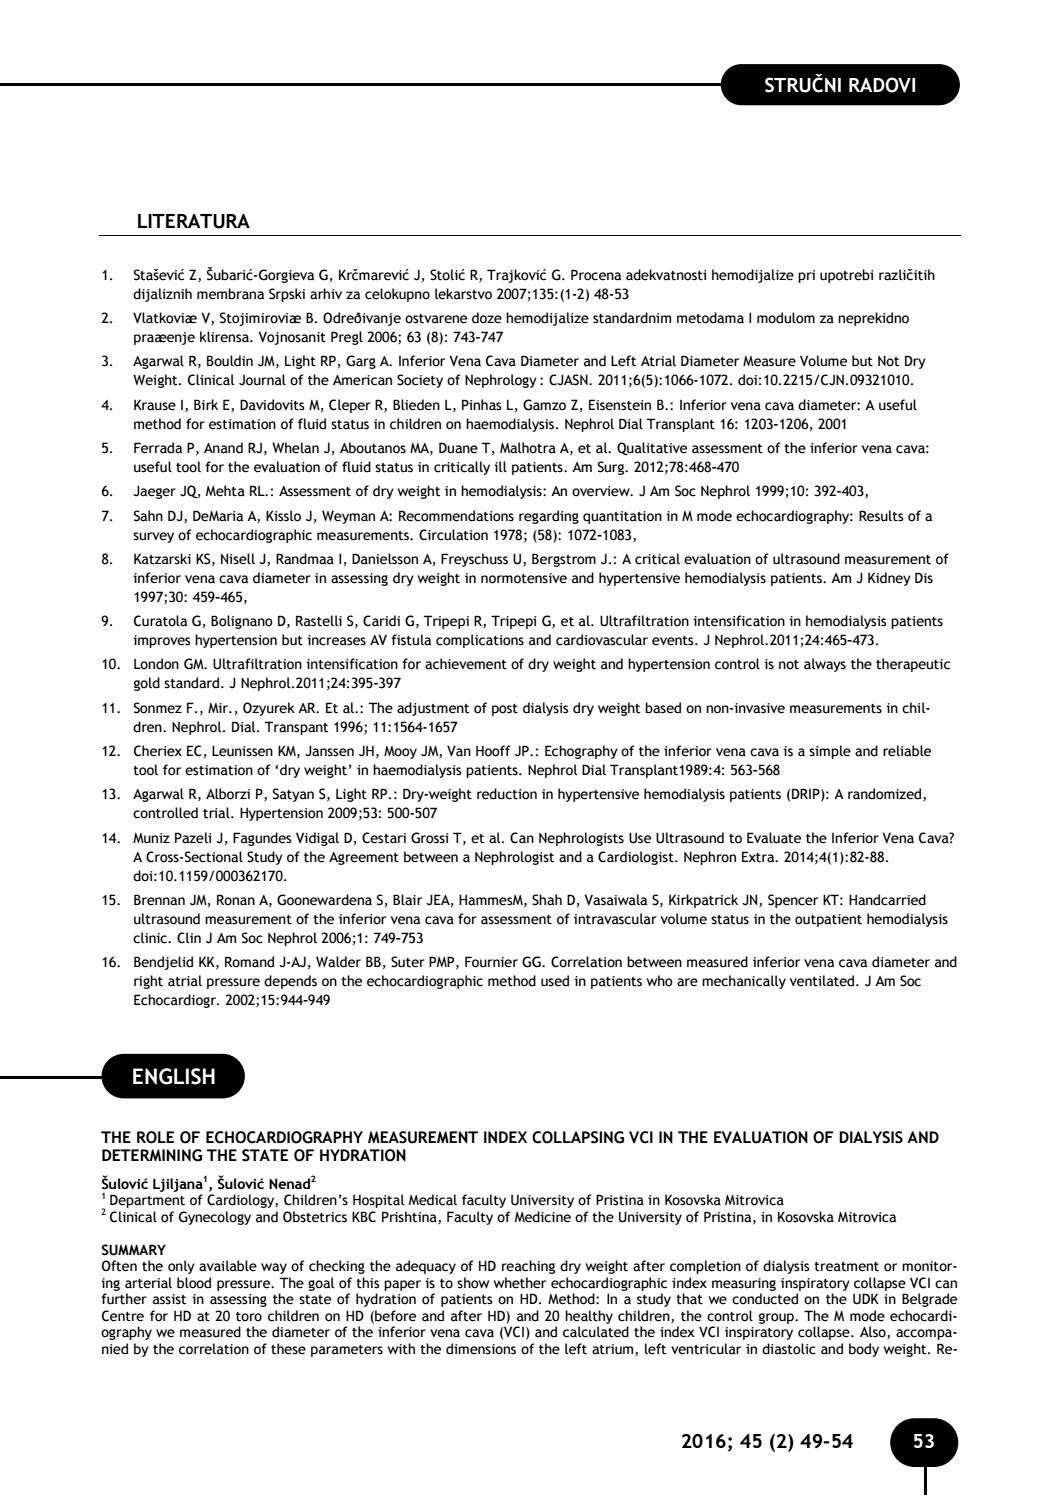 Praxis Medica 452 By Praxis Medica Nauni I Struni Asopis Issuu